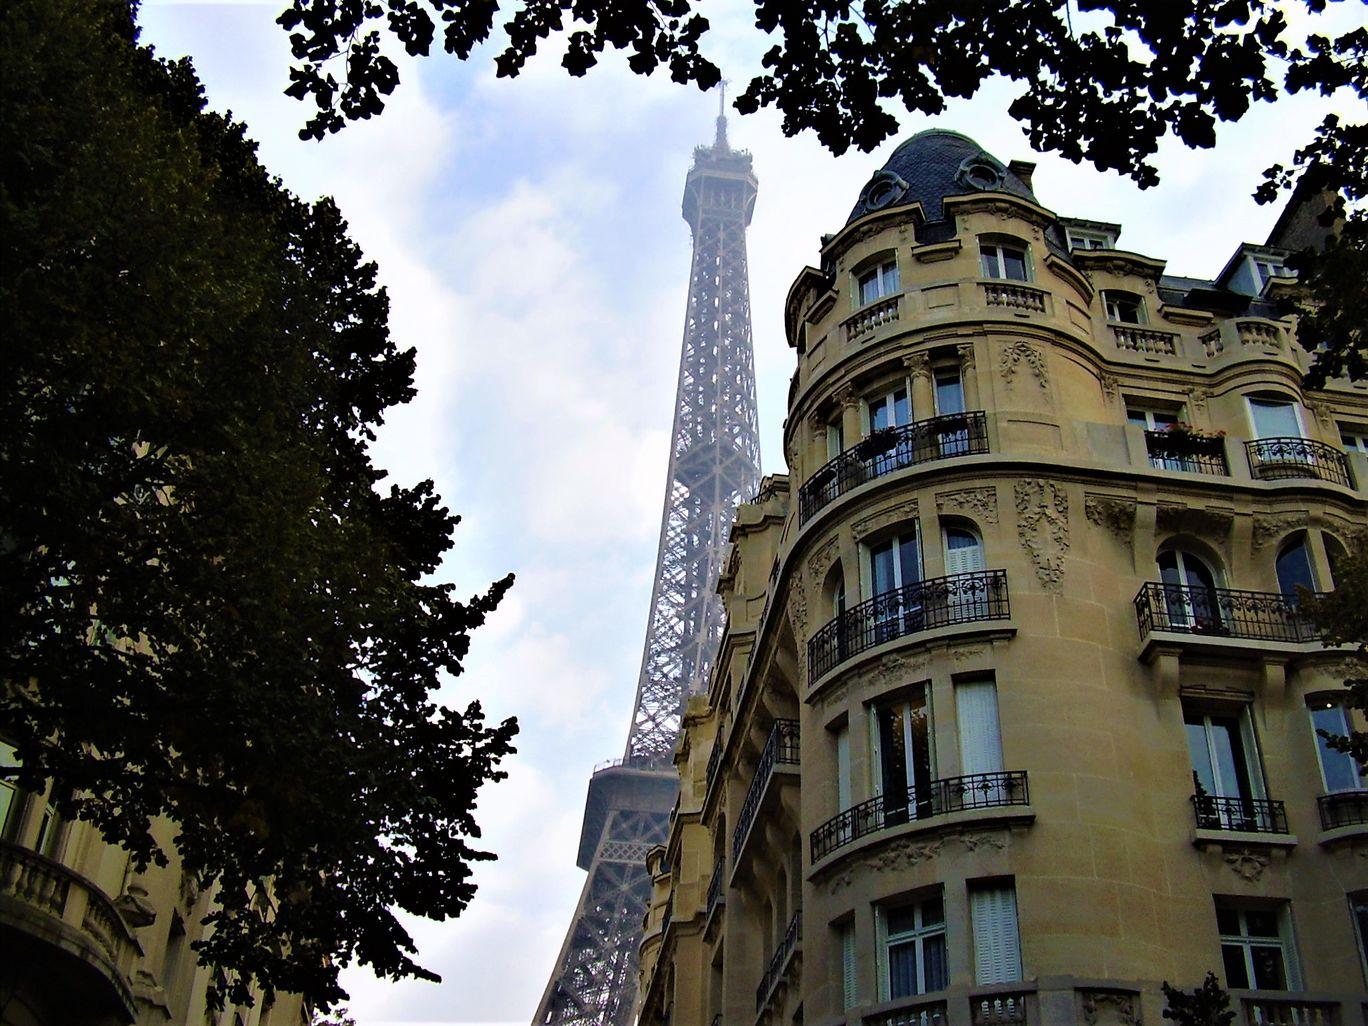 Photo of Paris By Aditya Pratap Deo